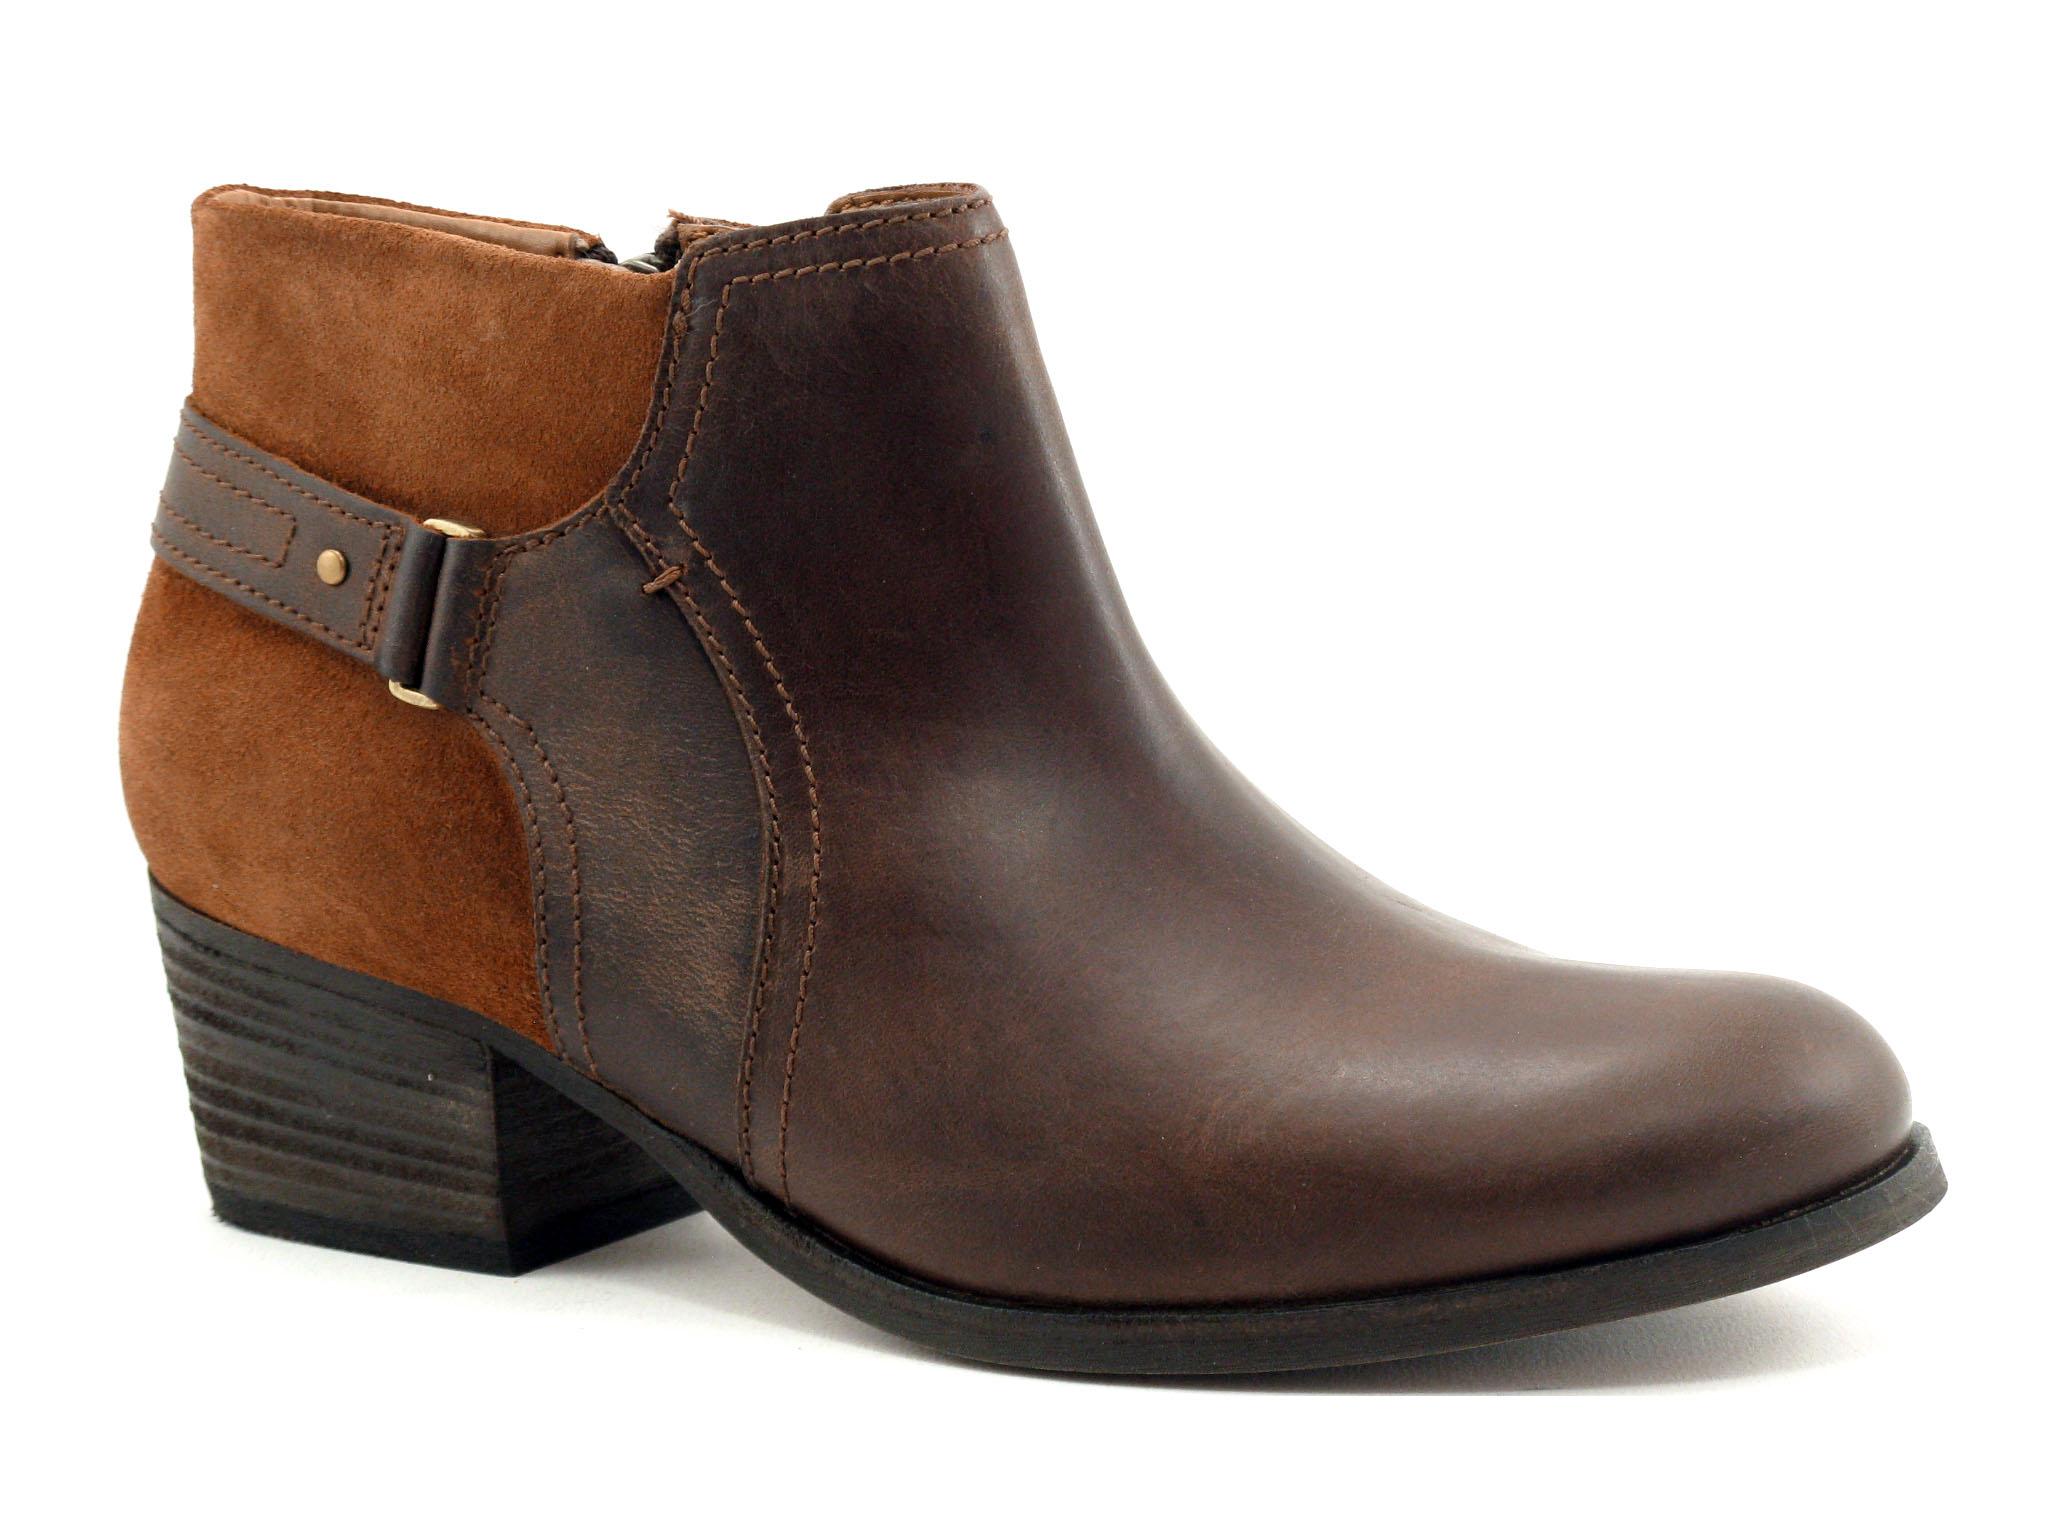 Boots femme clarks maypearl lilac dark tan...